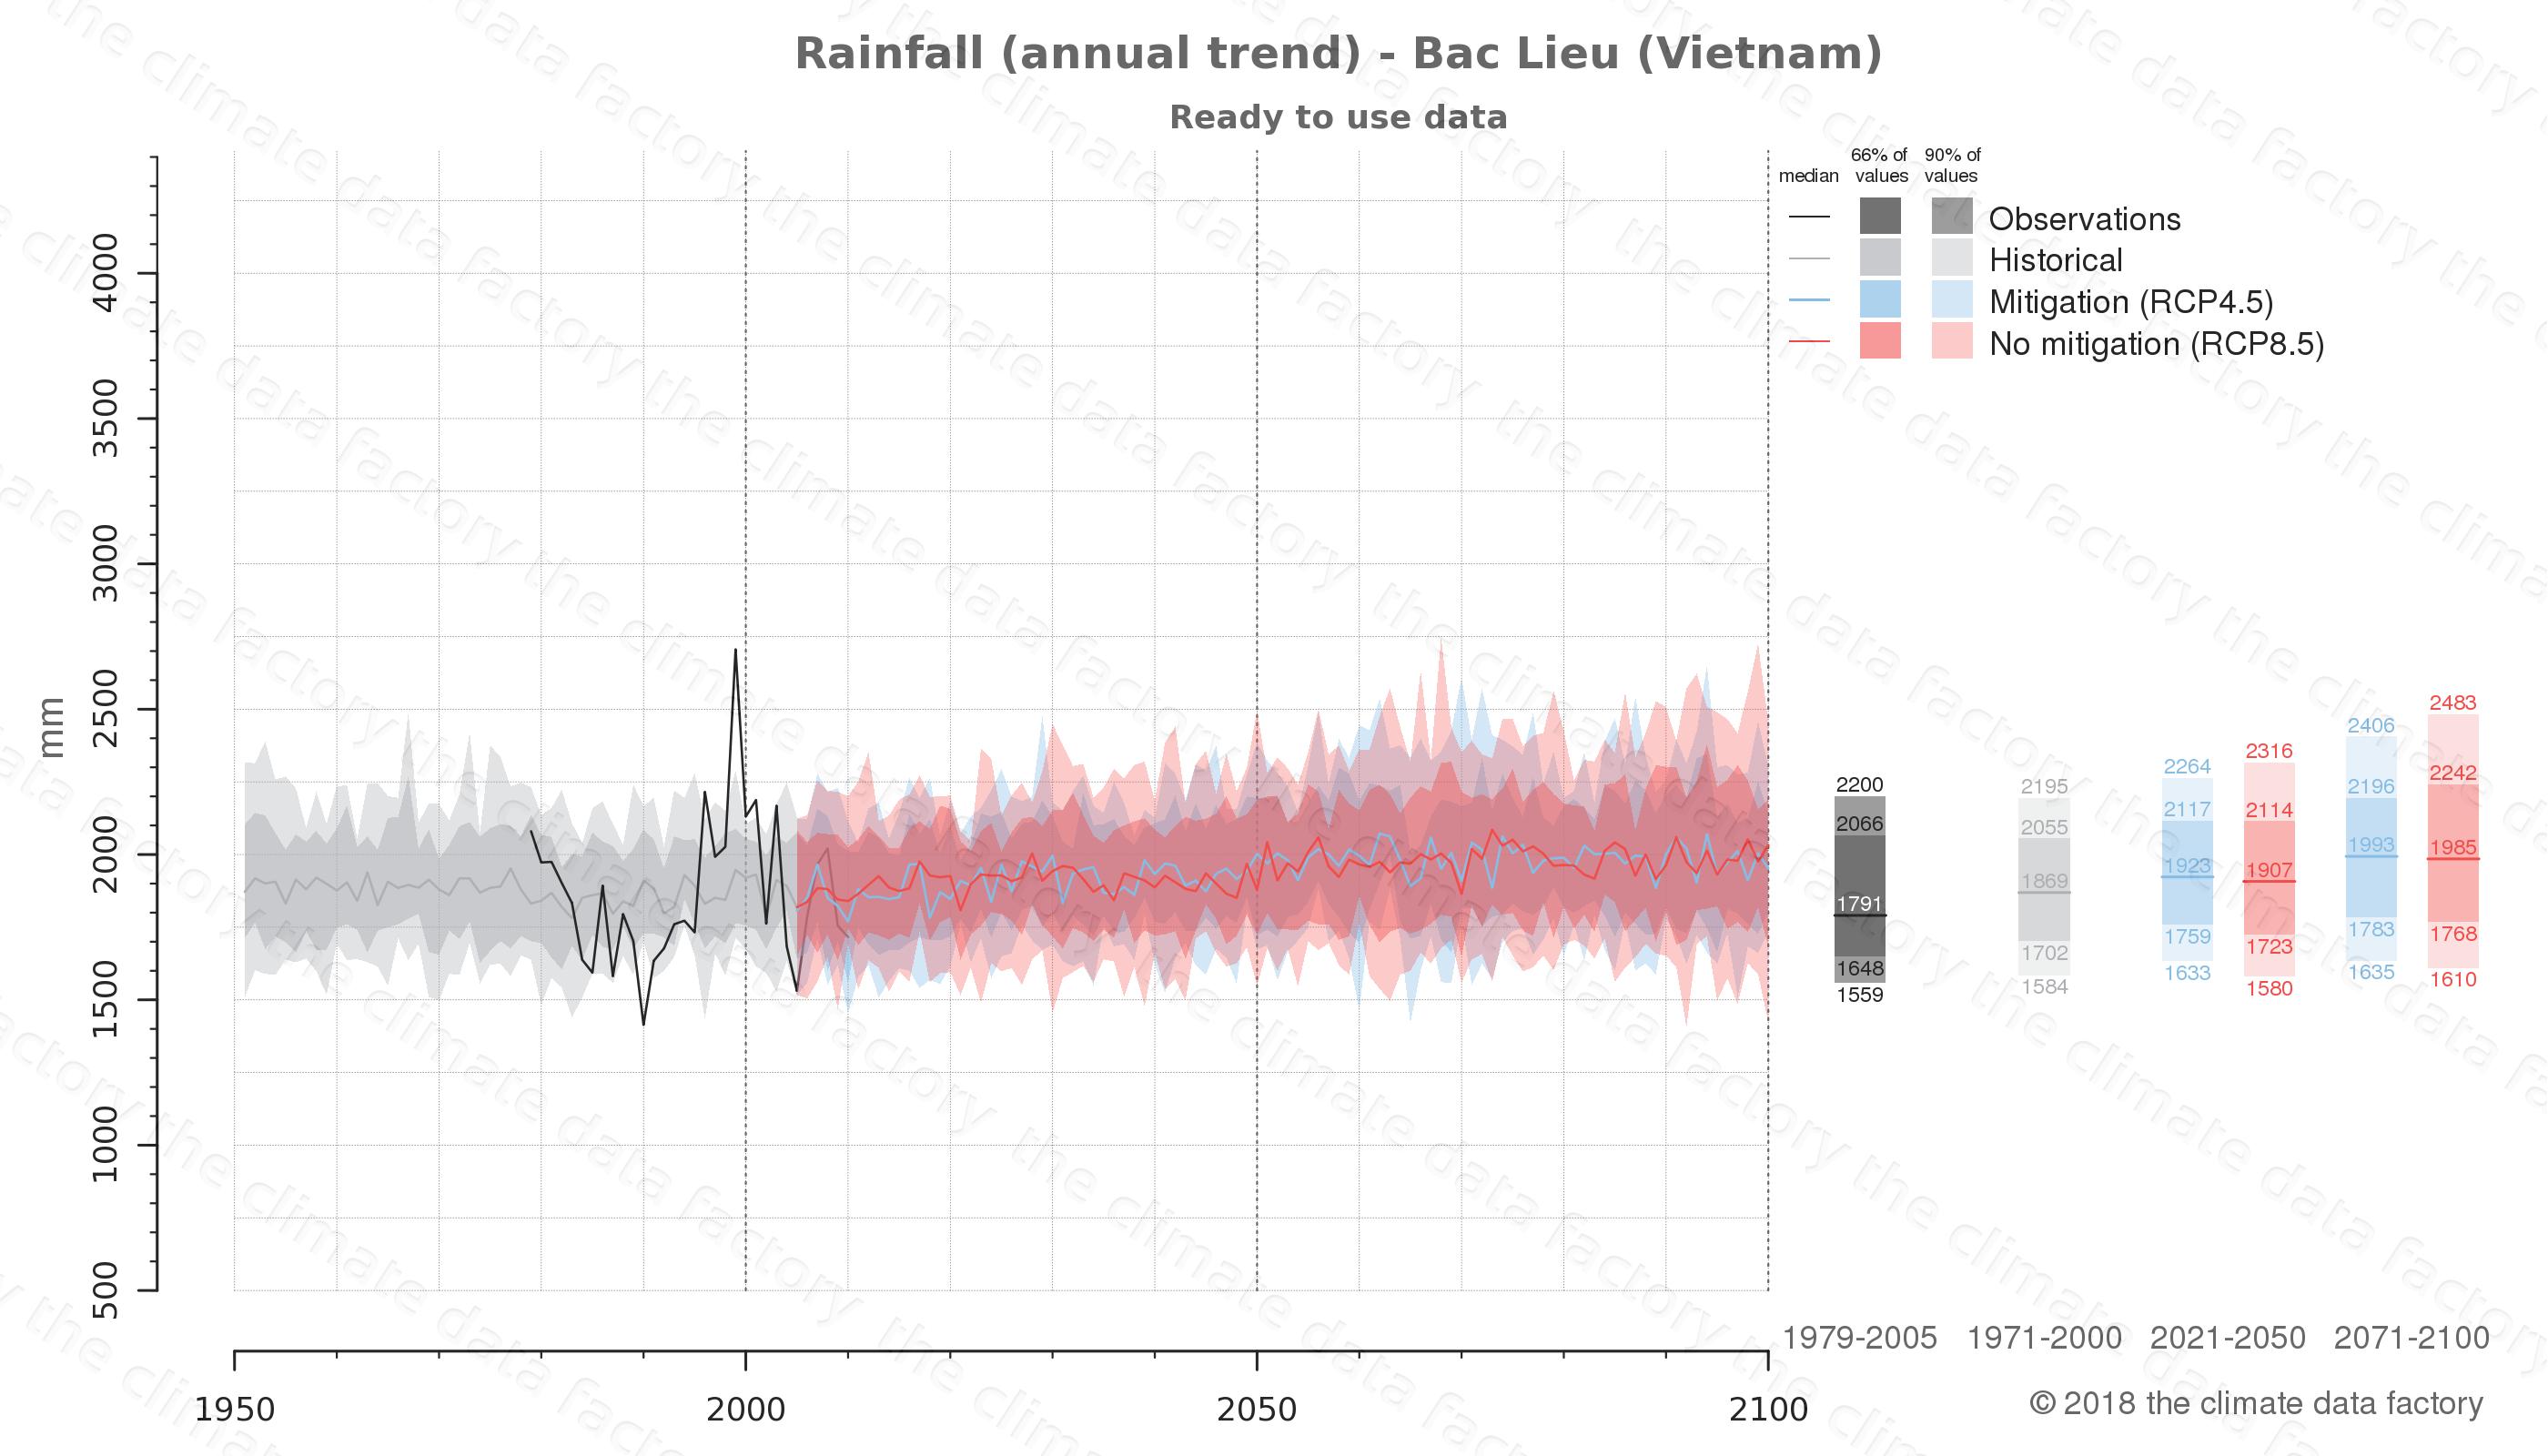 climate change data policy adaptation climate graph city data rainfall bac lieu vietnam